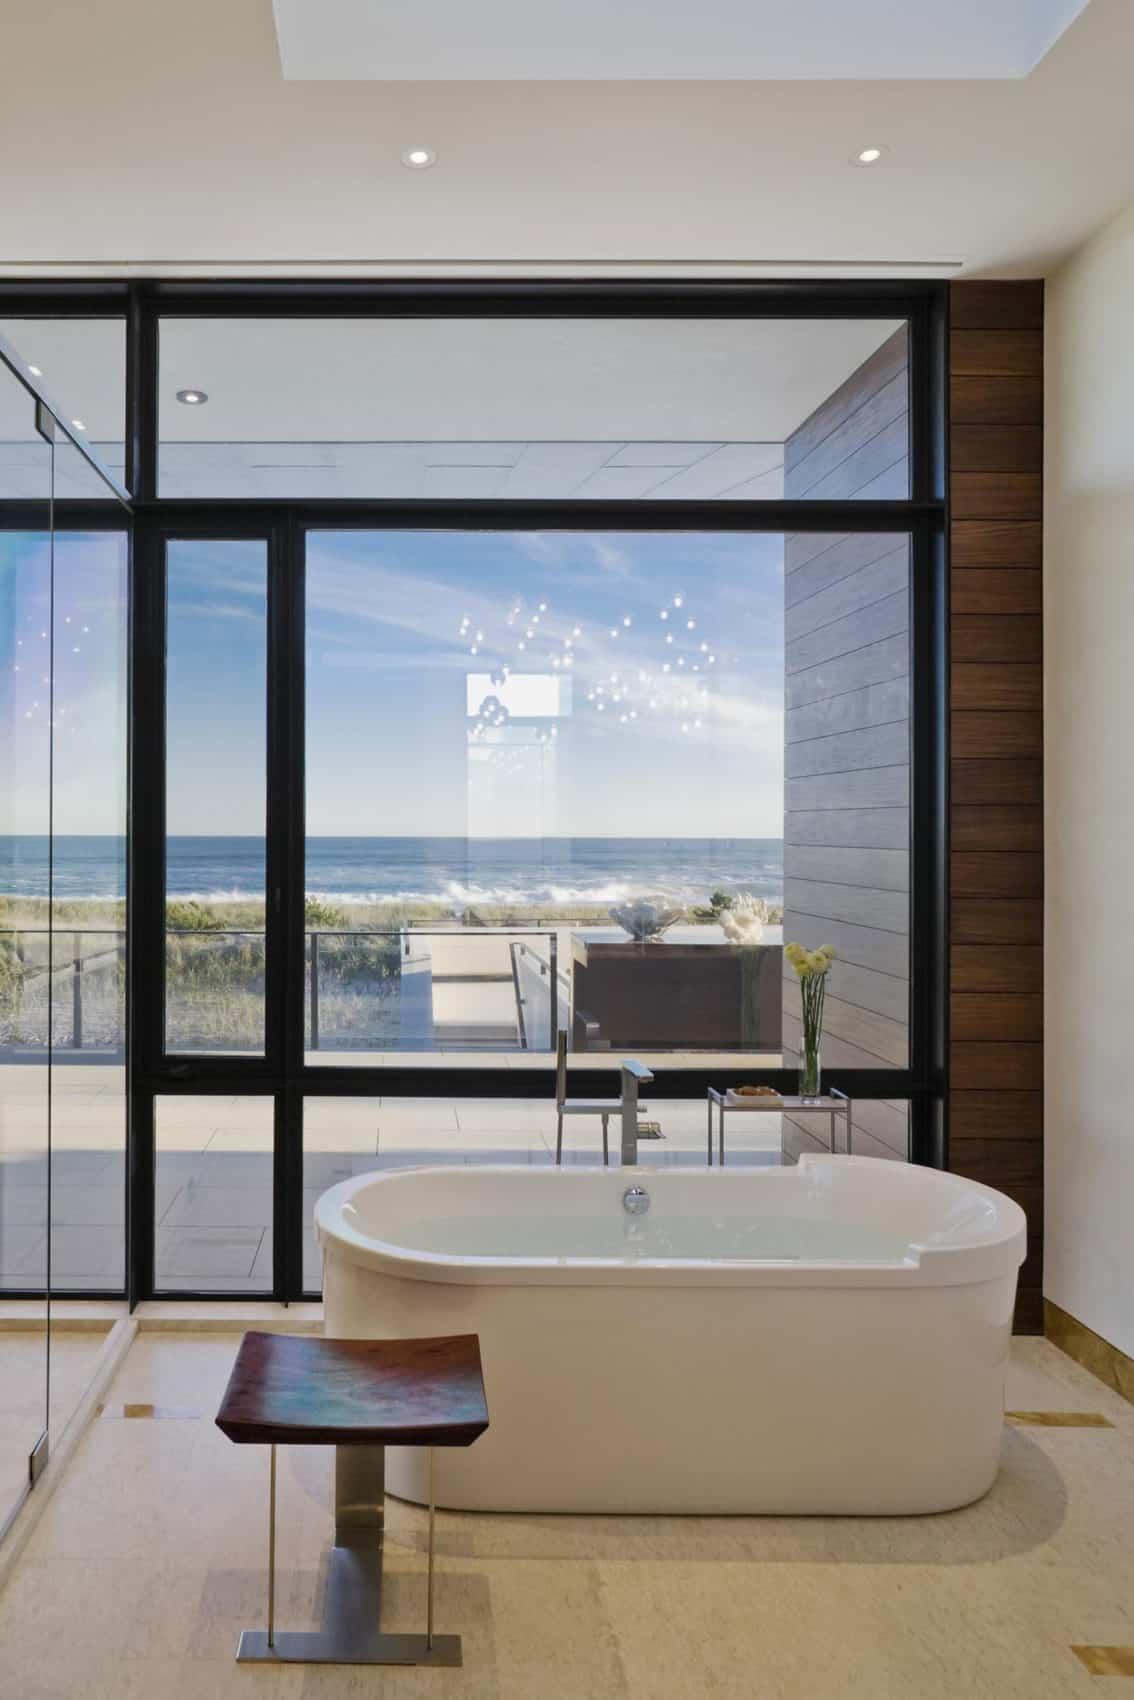 Southampton Beach House by Alexander Gorlin Architects (7)